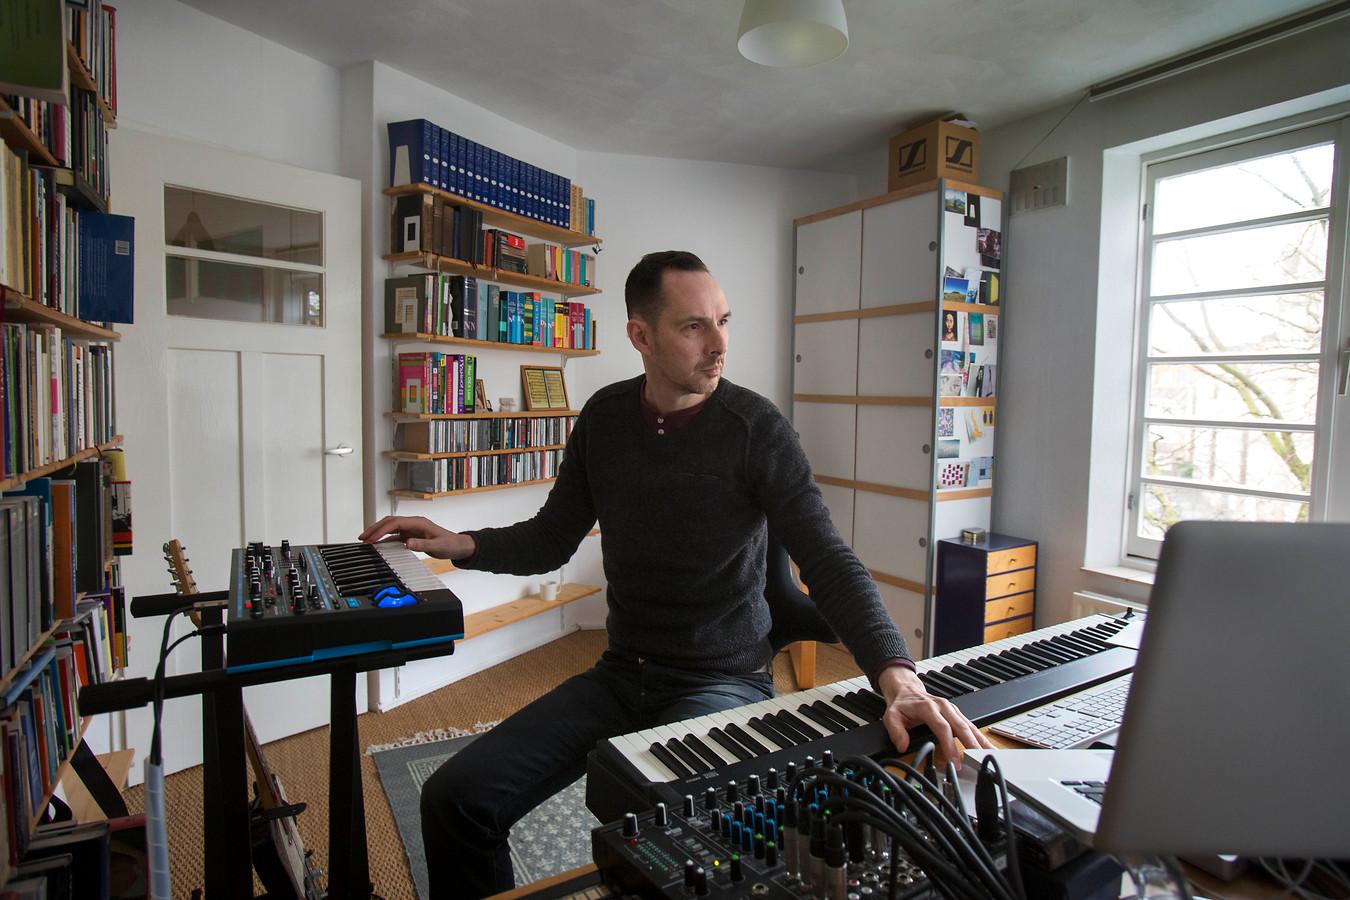 Anthony Fiumara op zijn werkkamer in Amsterdam. Foto: Werry Crone